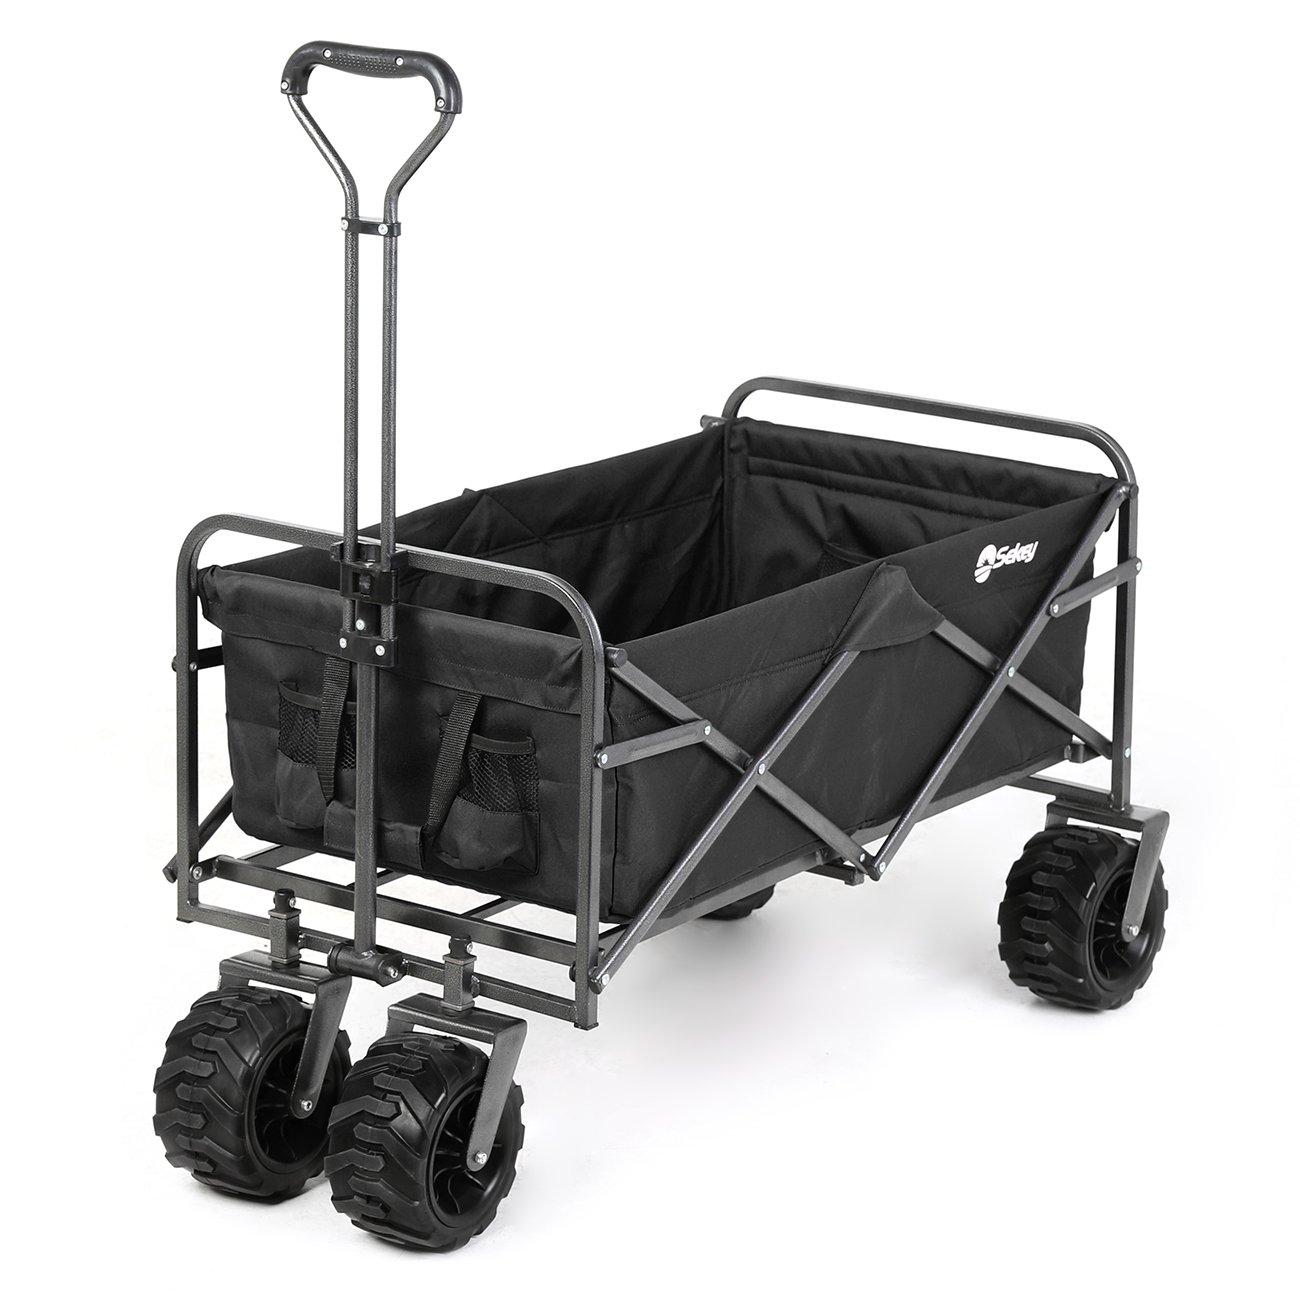 Sekey Folding Wagon Cart Collapsible Outdoor Utility Wagon Heavy Duty Beach Wagon with All-Terrain Wheels, 265 Pound Capacity, Black by Sekey